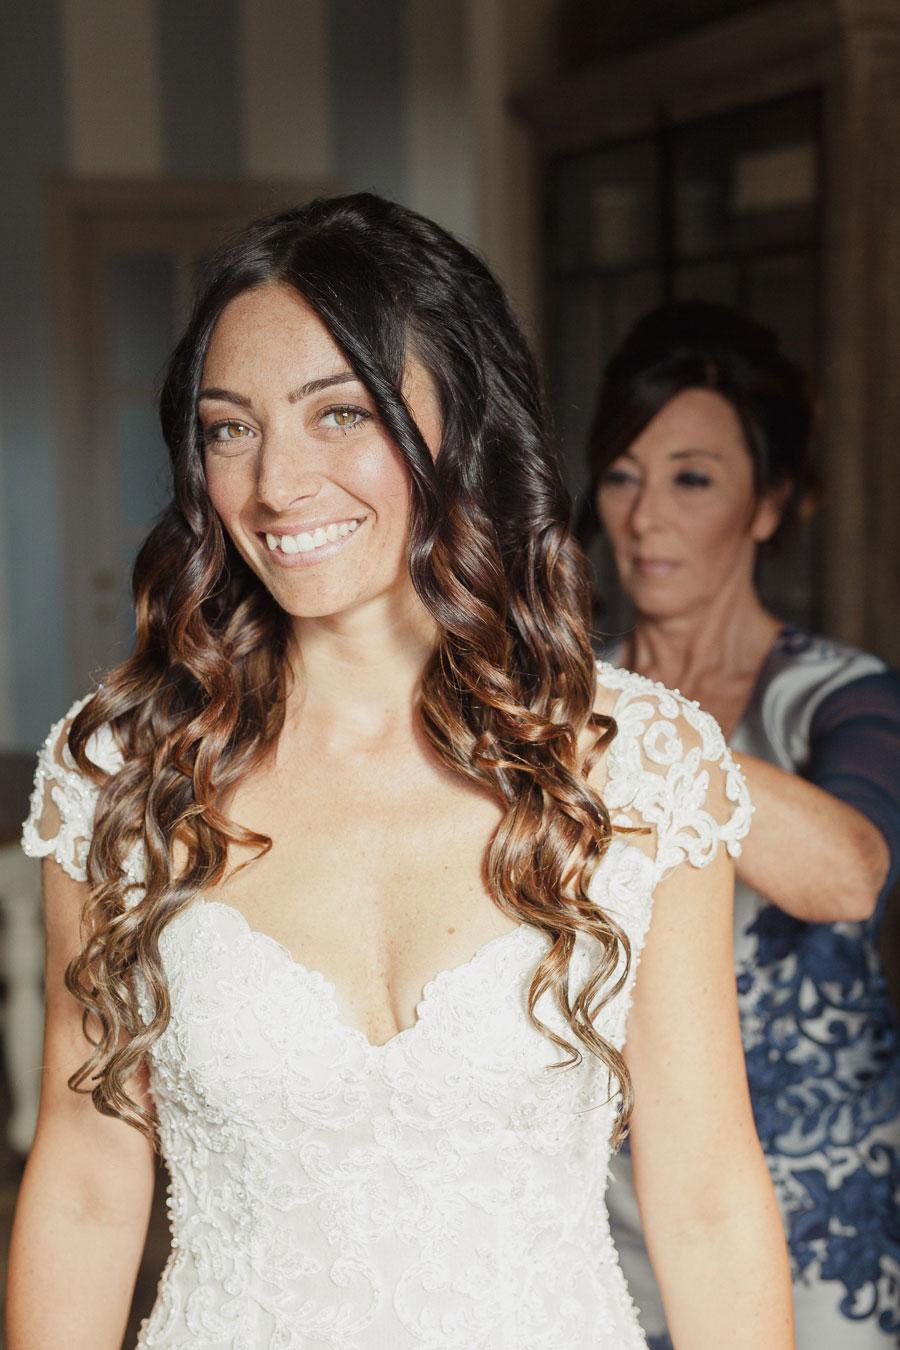 Wedding-Nicholad-and-Federica-Giuseppe-Giovannelli-277